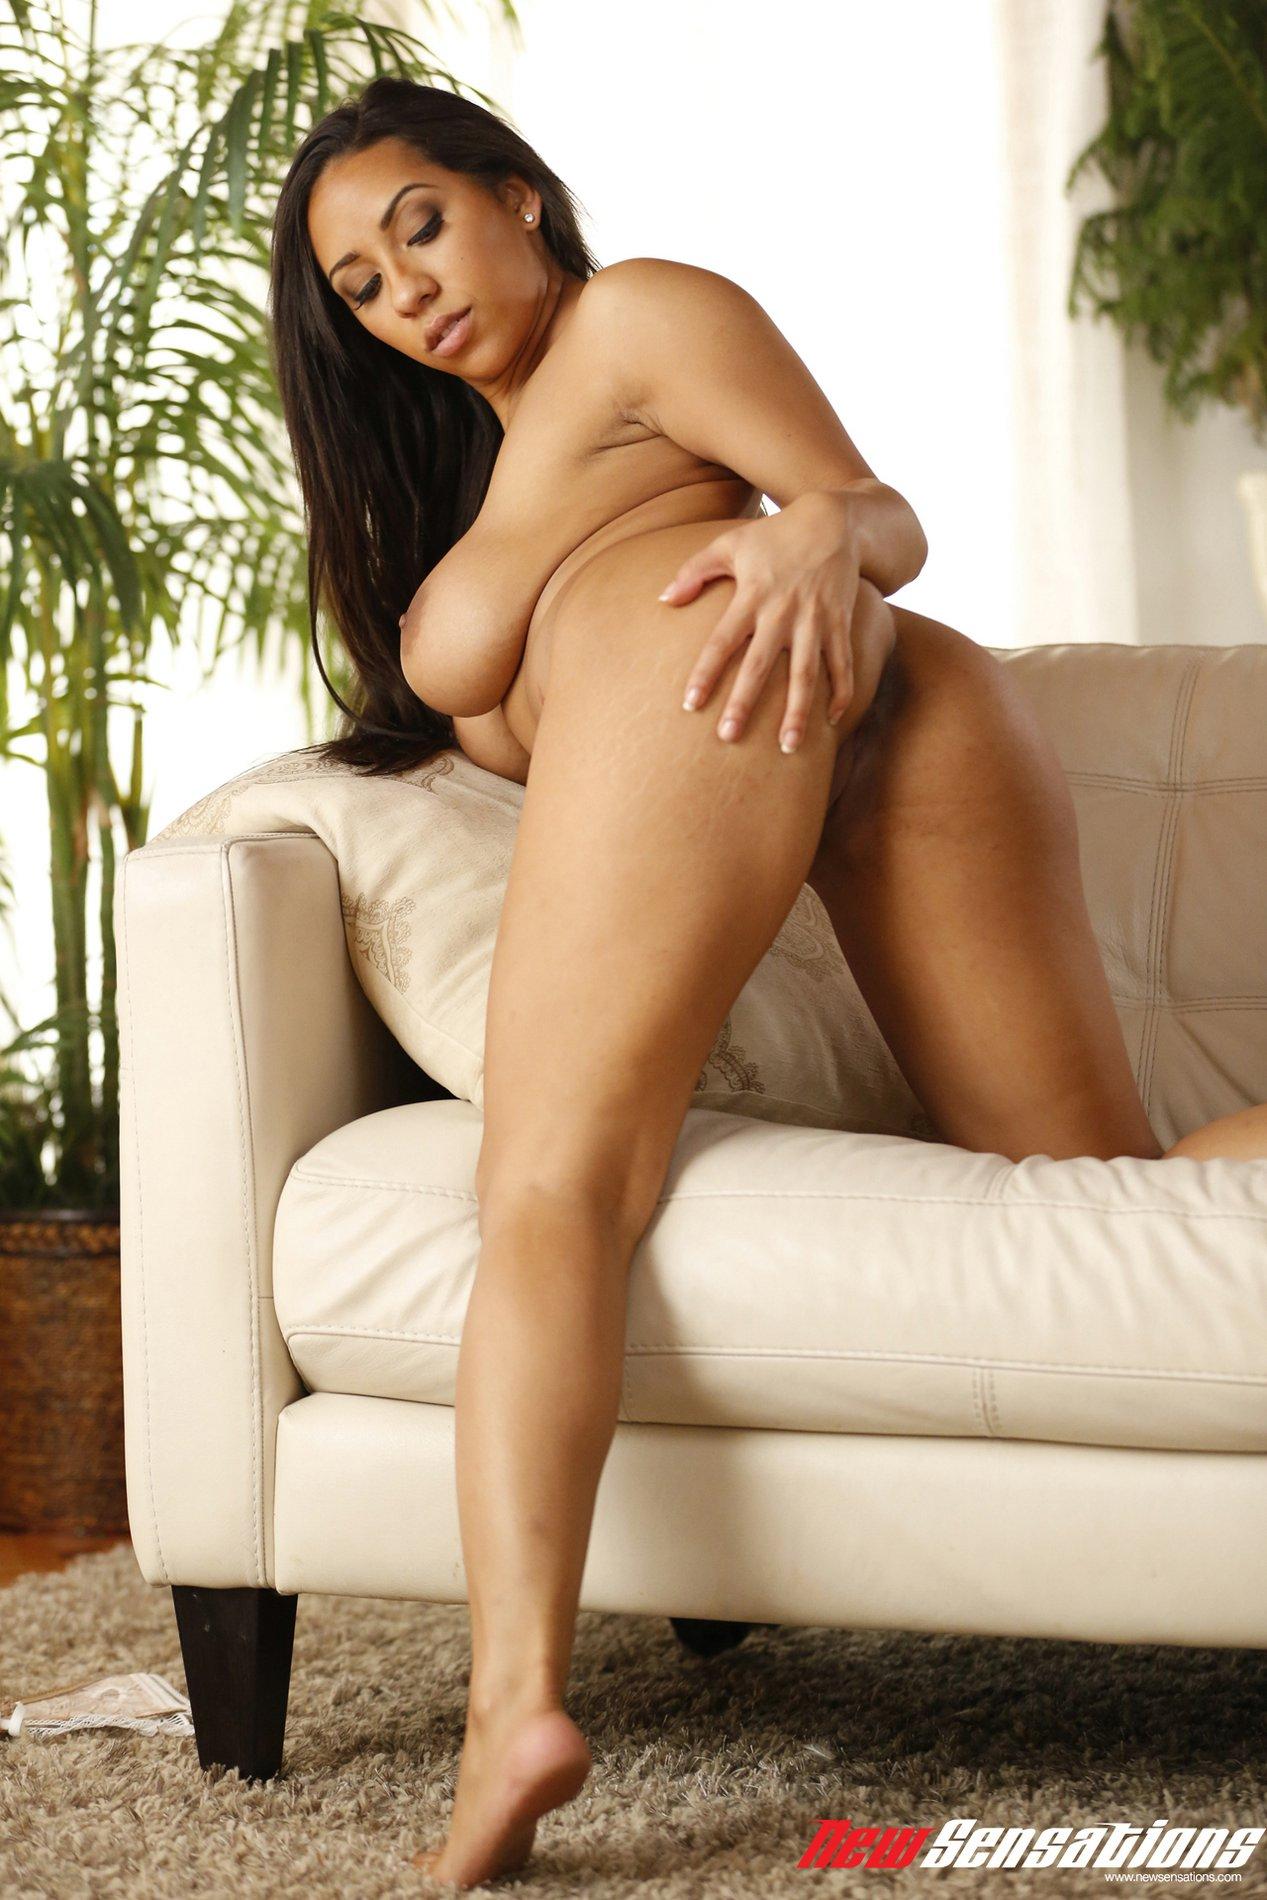 Priya price naked